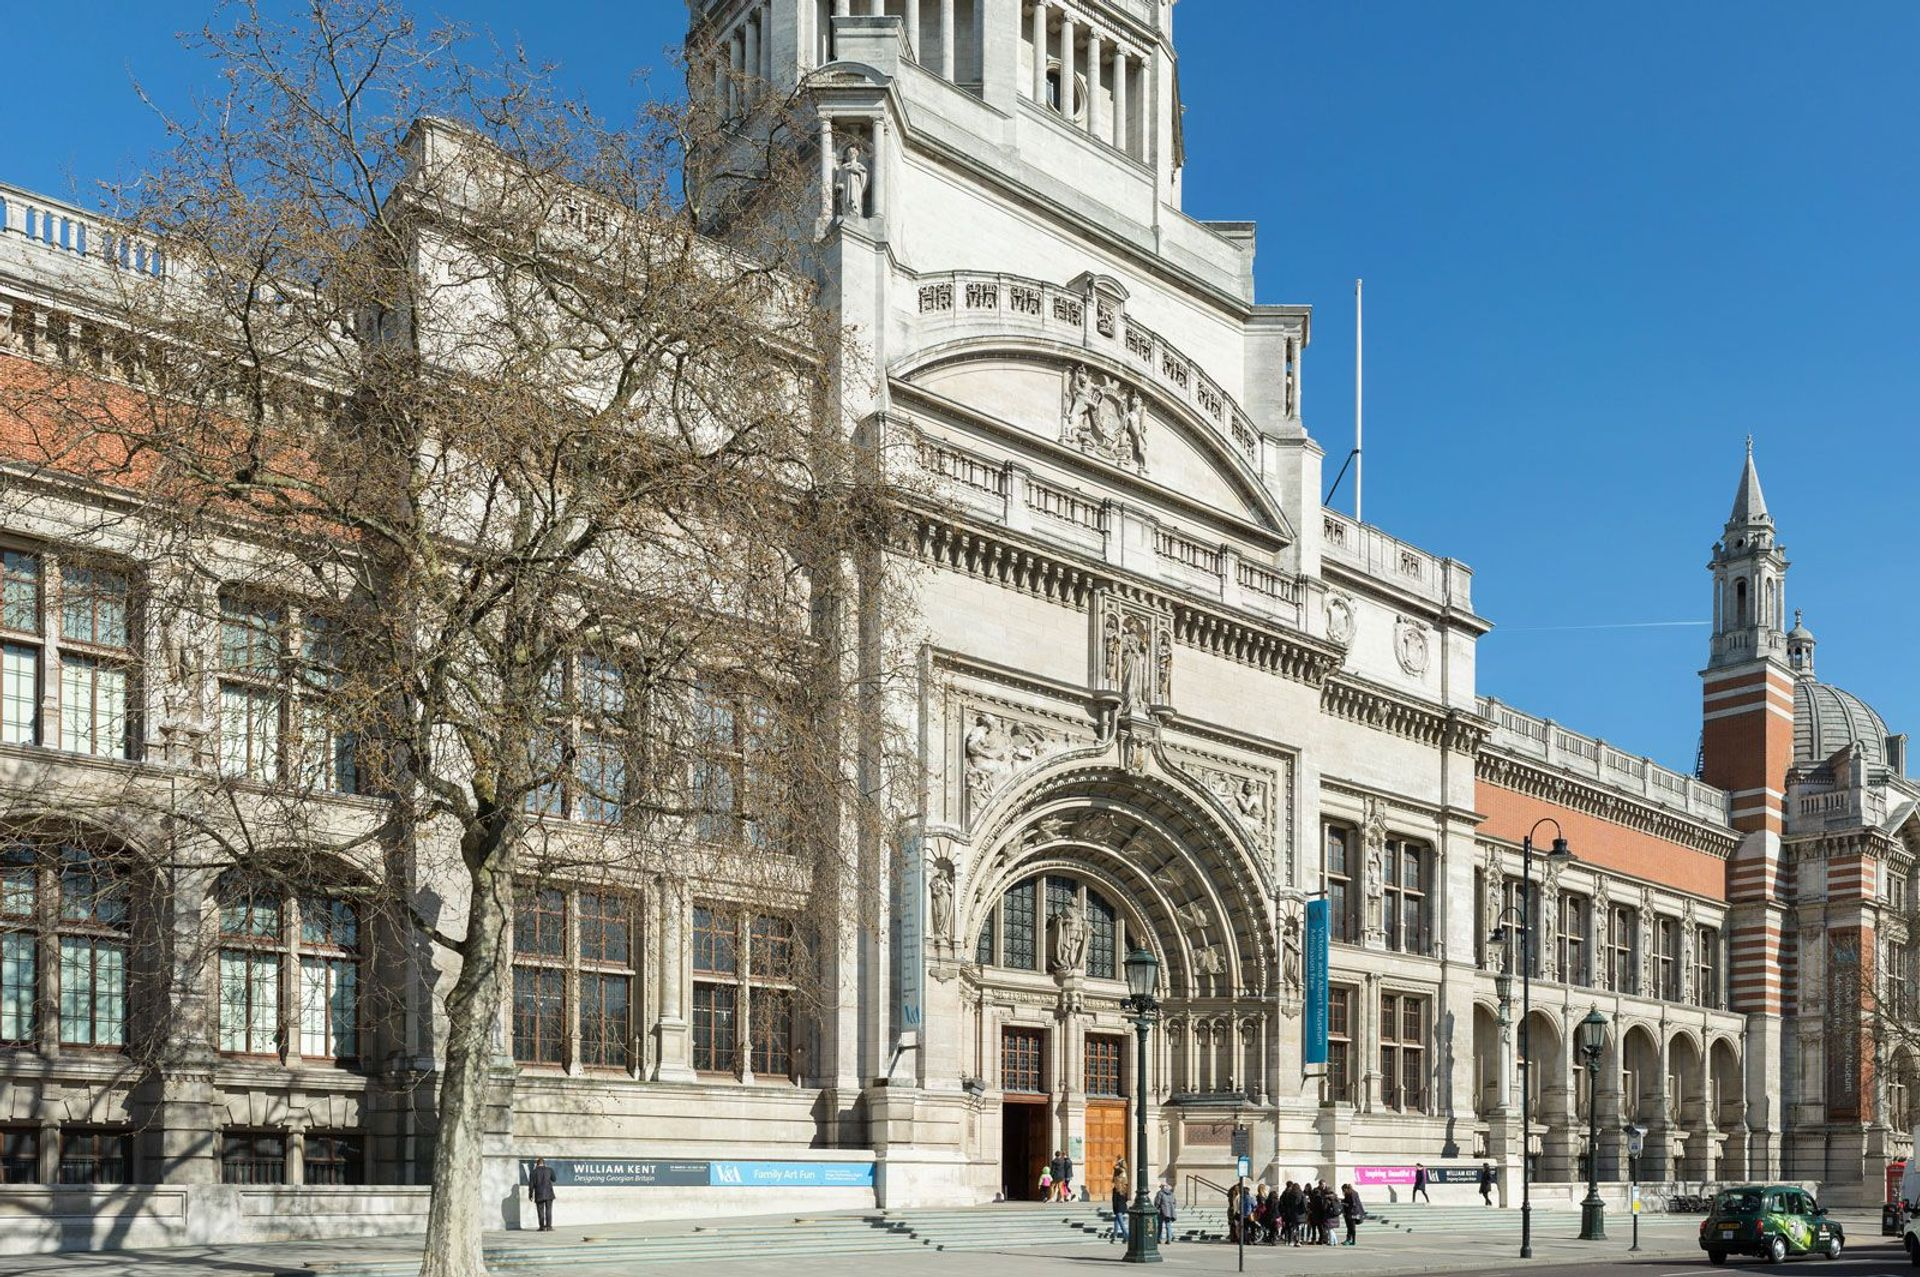 The Victoria and Albert Museum in London Photo: David Iliff; License: CC BY-SA 3.0